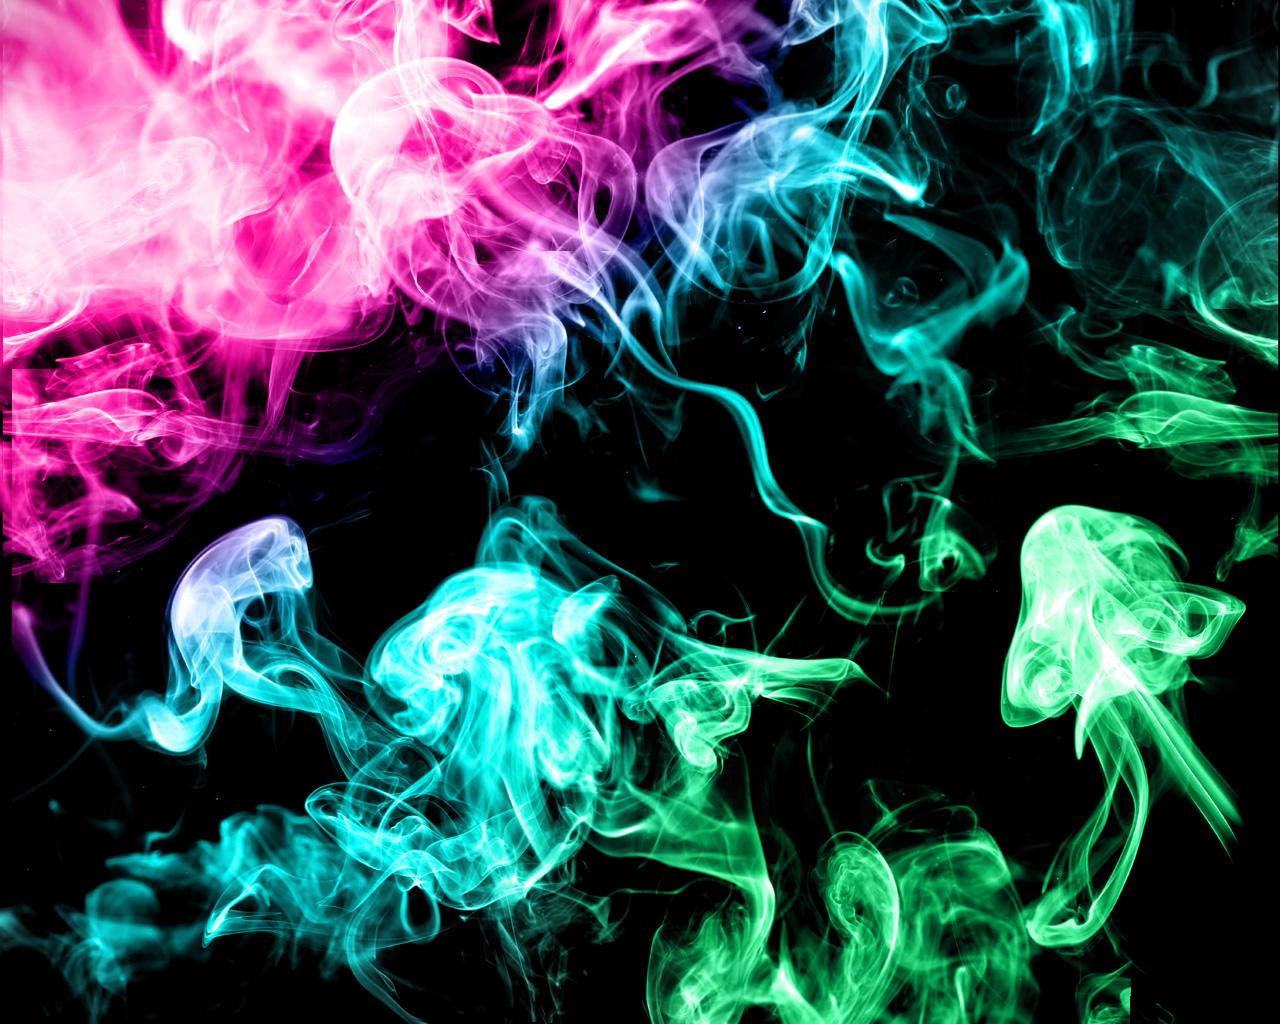 Colorful Smoke HD Wallpapers 1280x1024